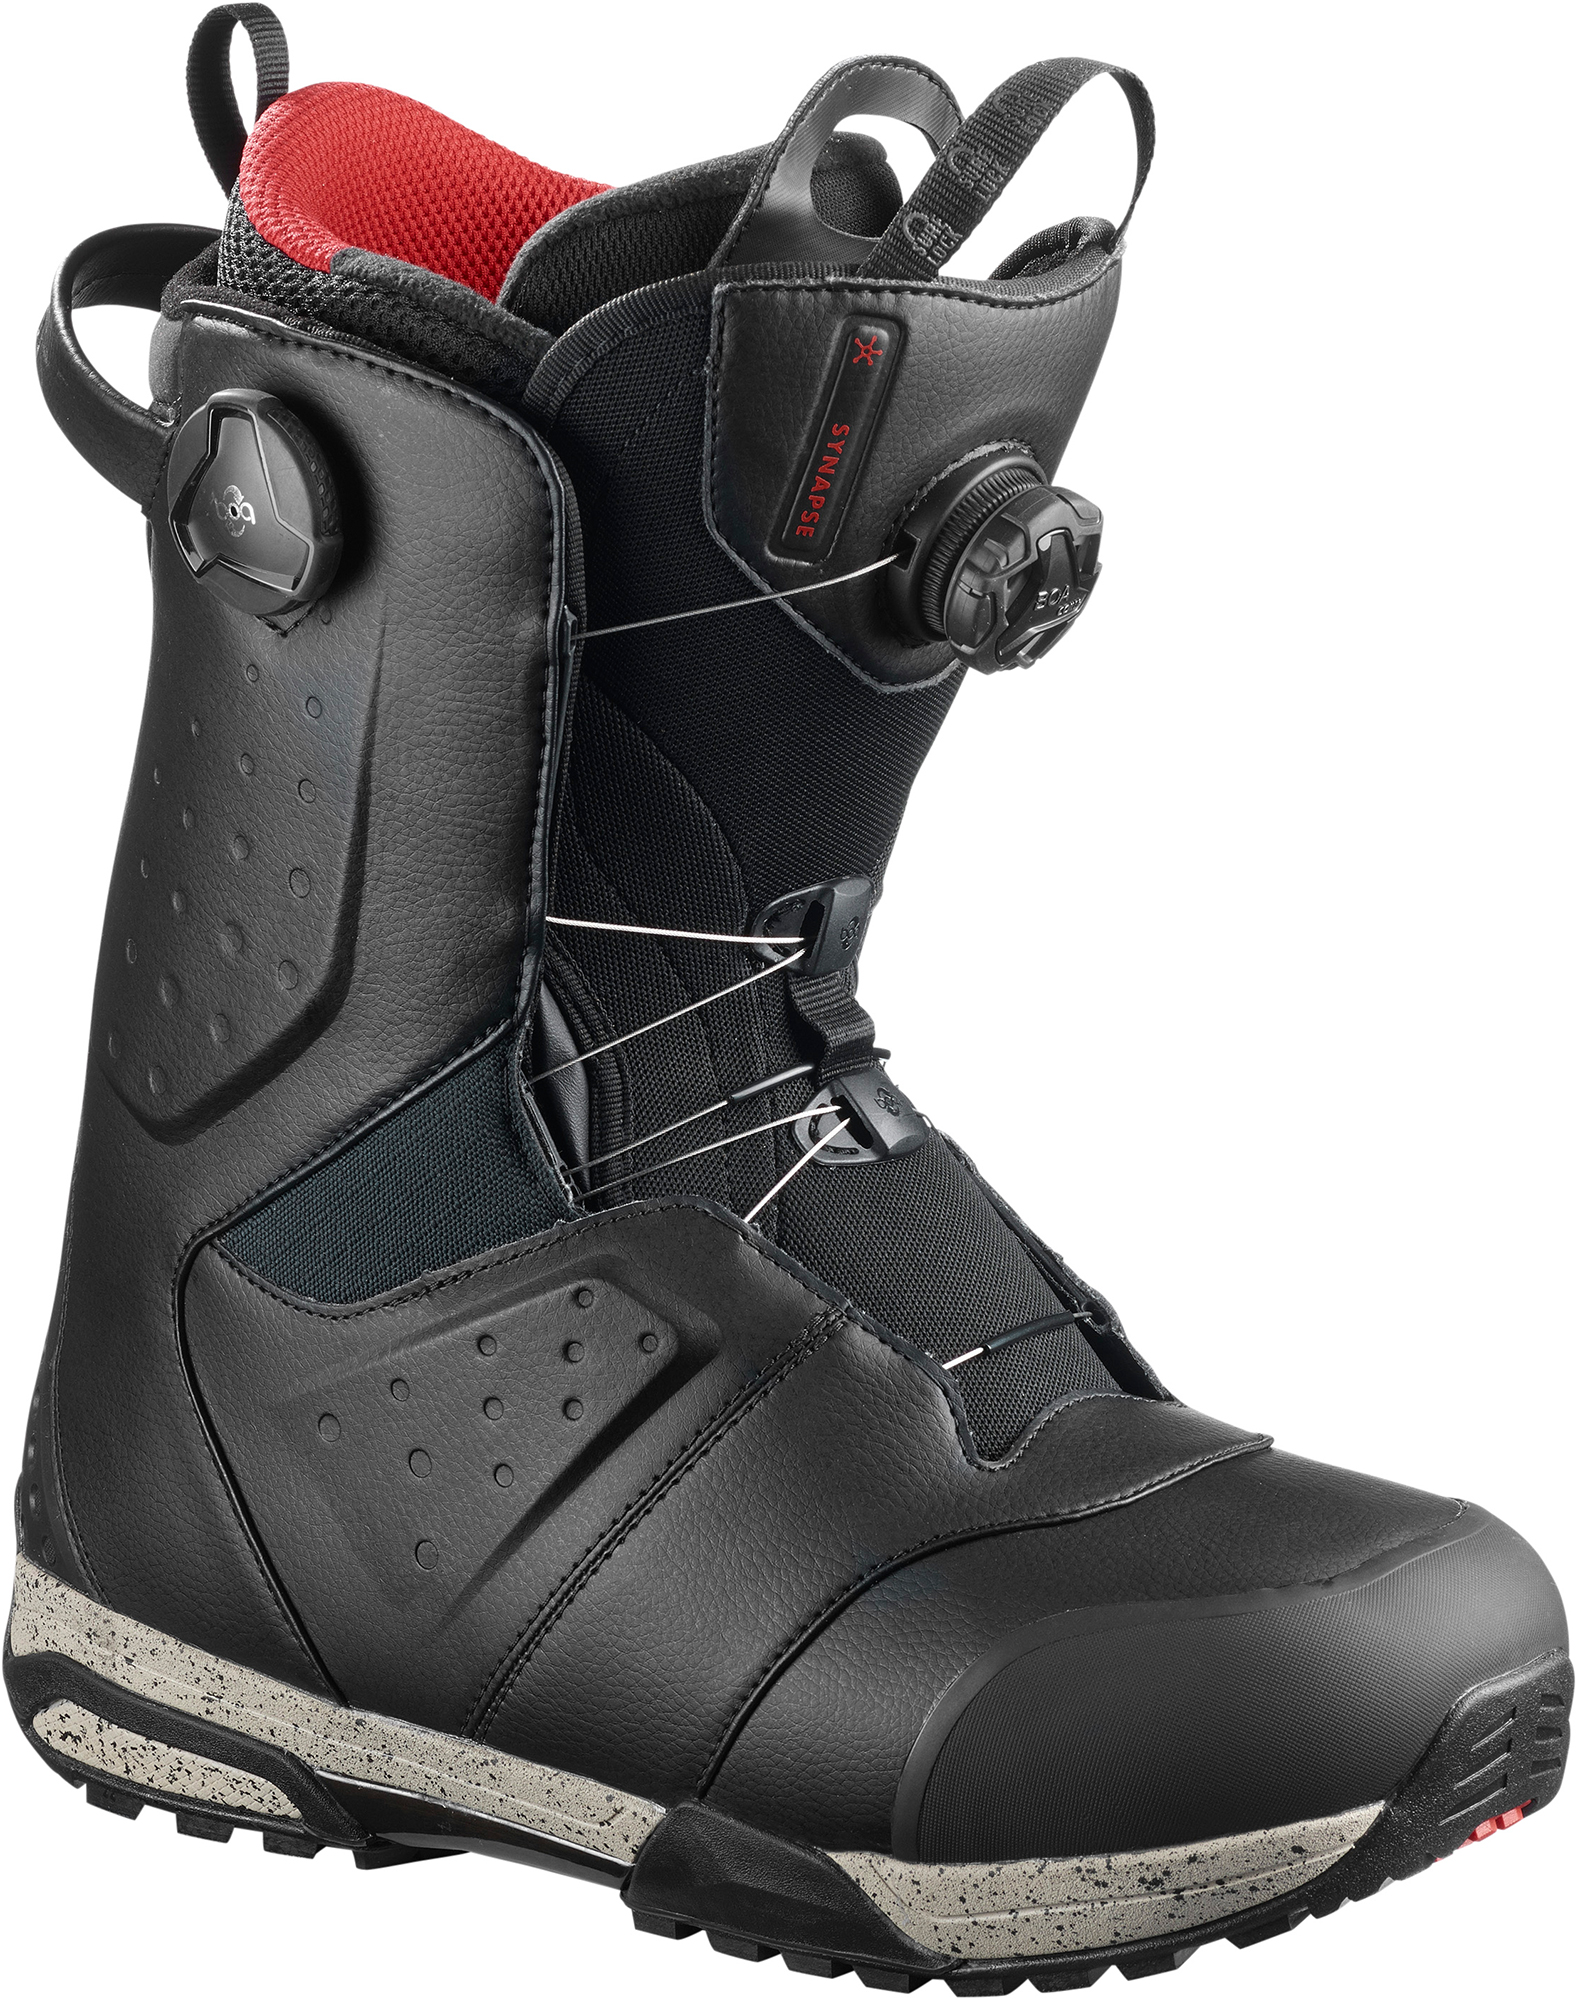 Salomon Сноубордические ботинки Salomon Synapse Focus Boa, размер 42,5 цена 2017